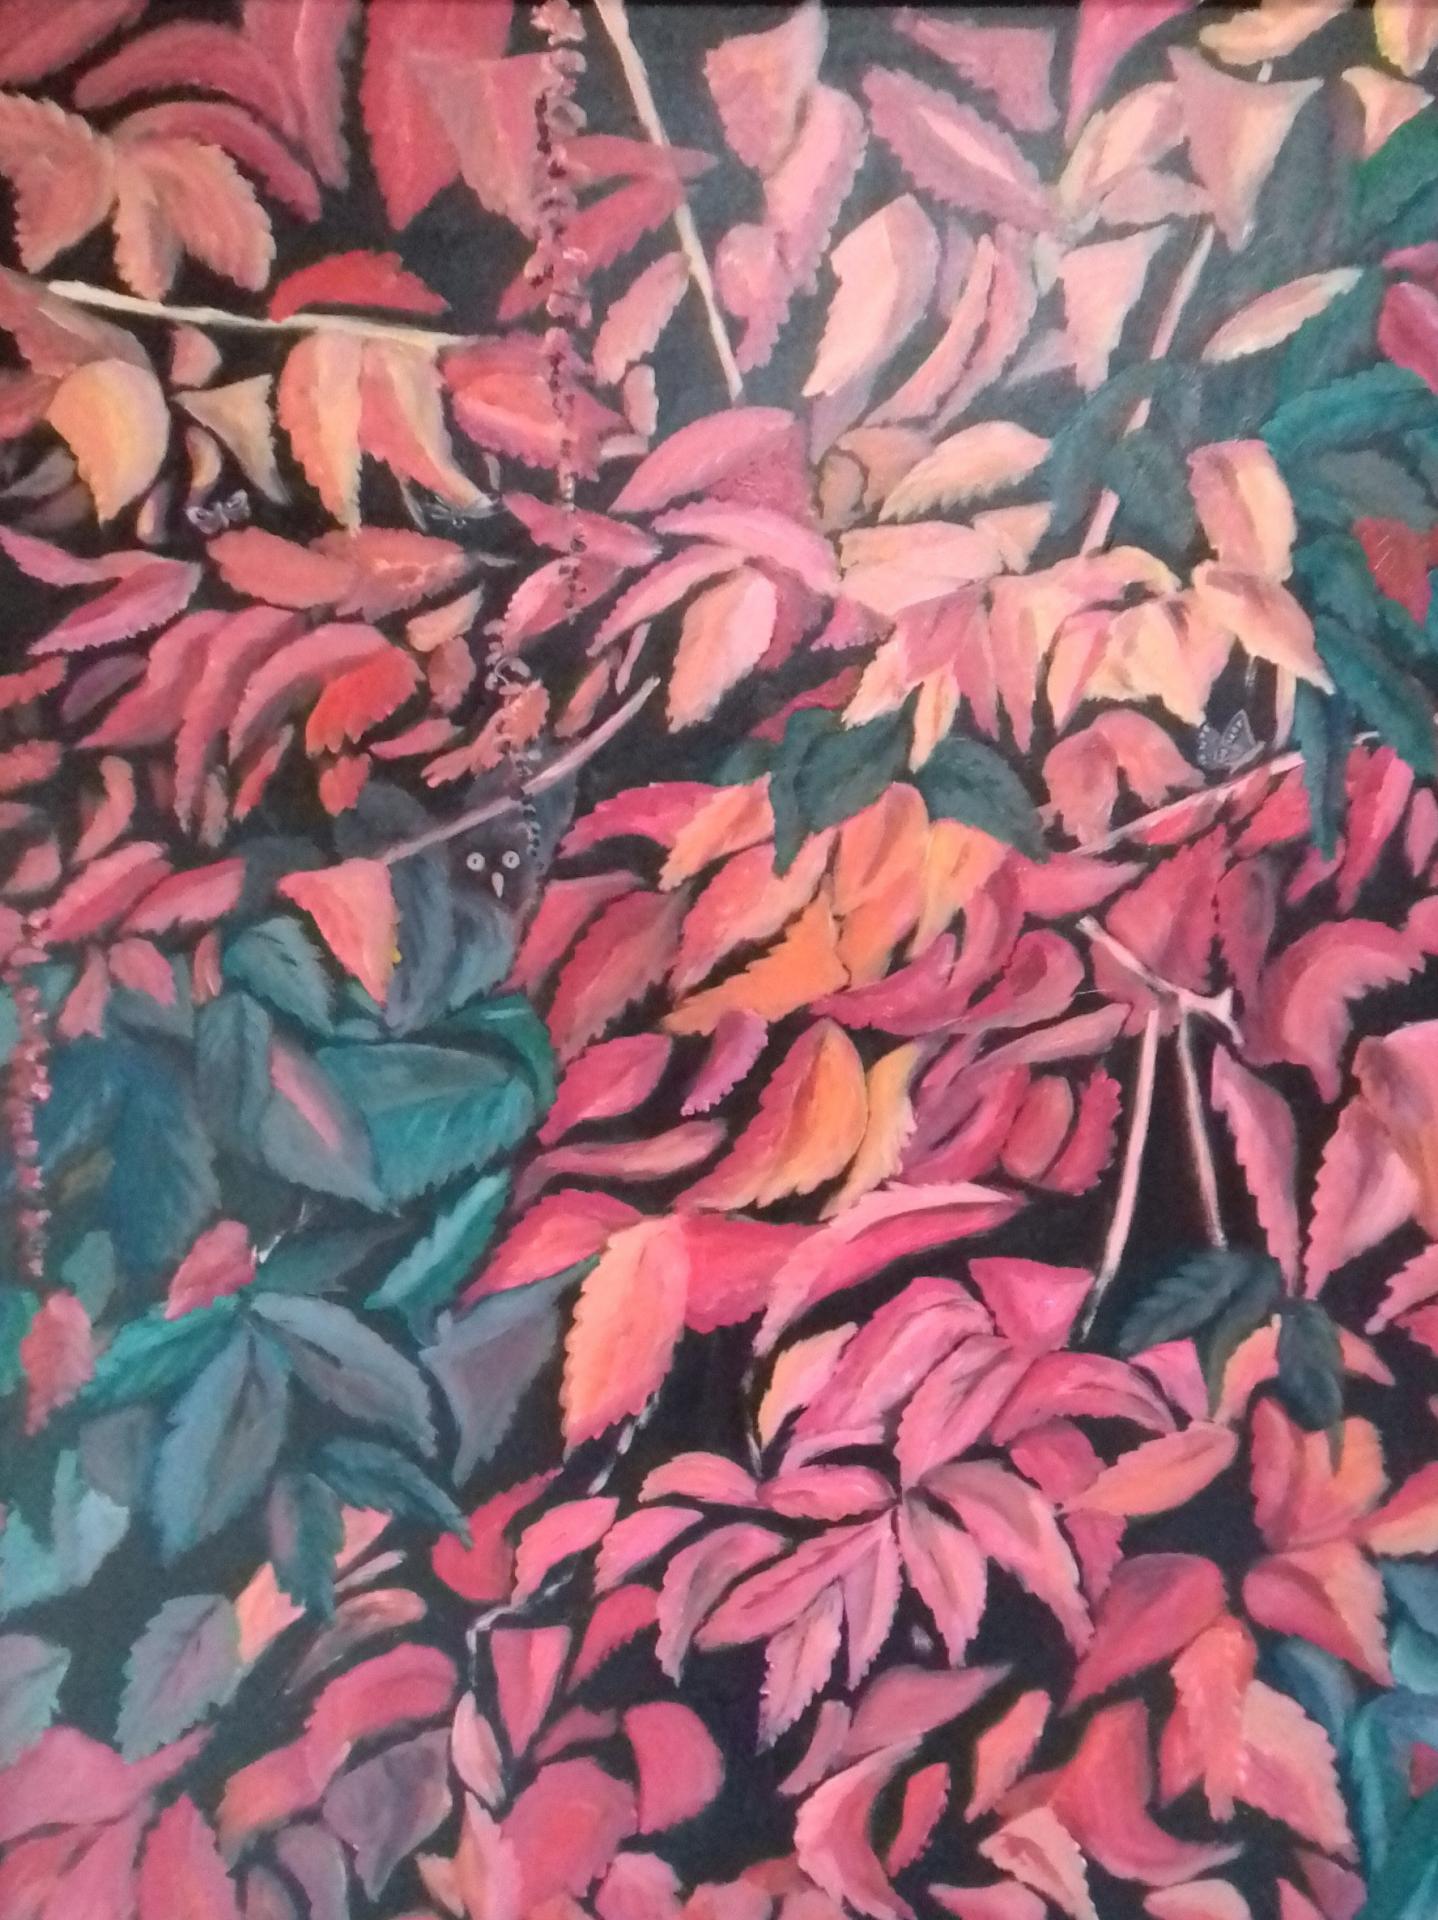 Kletterwein-1   2019   Acryl auf Leinwand   80 x 100 cm